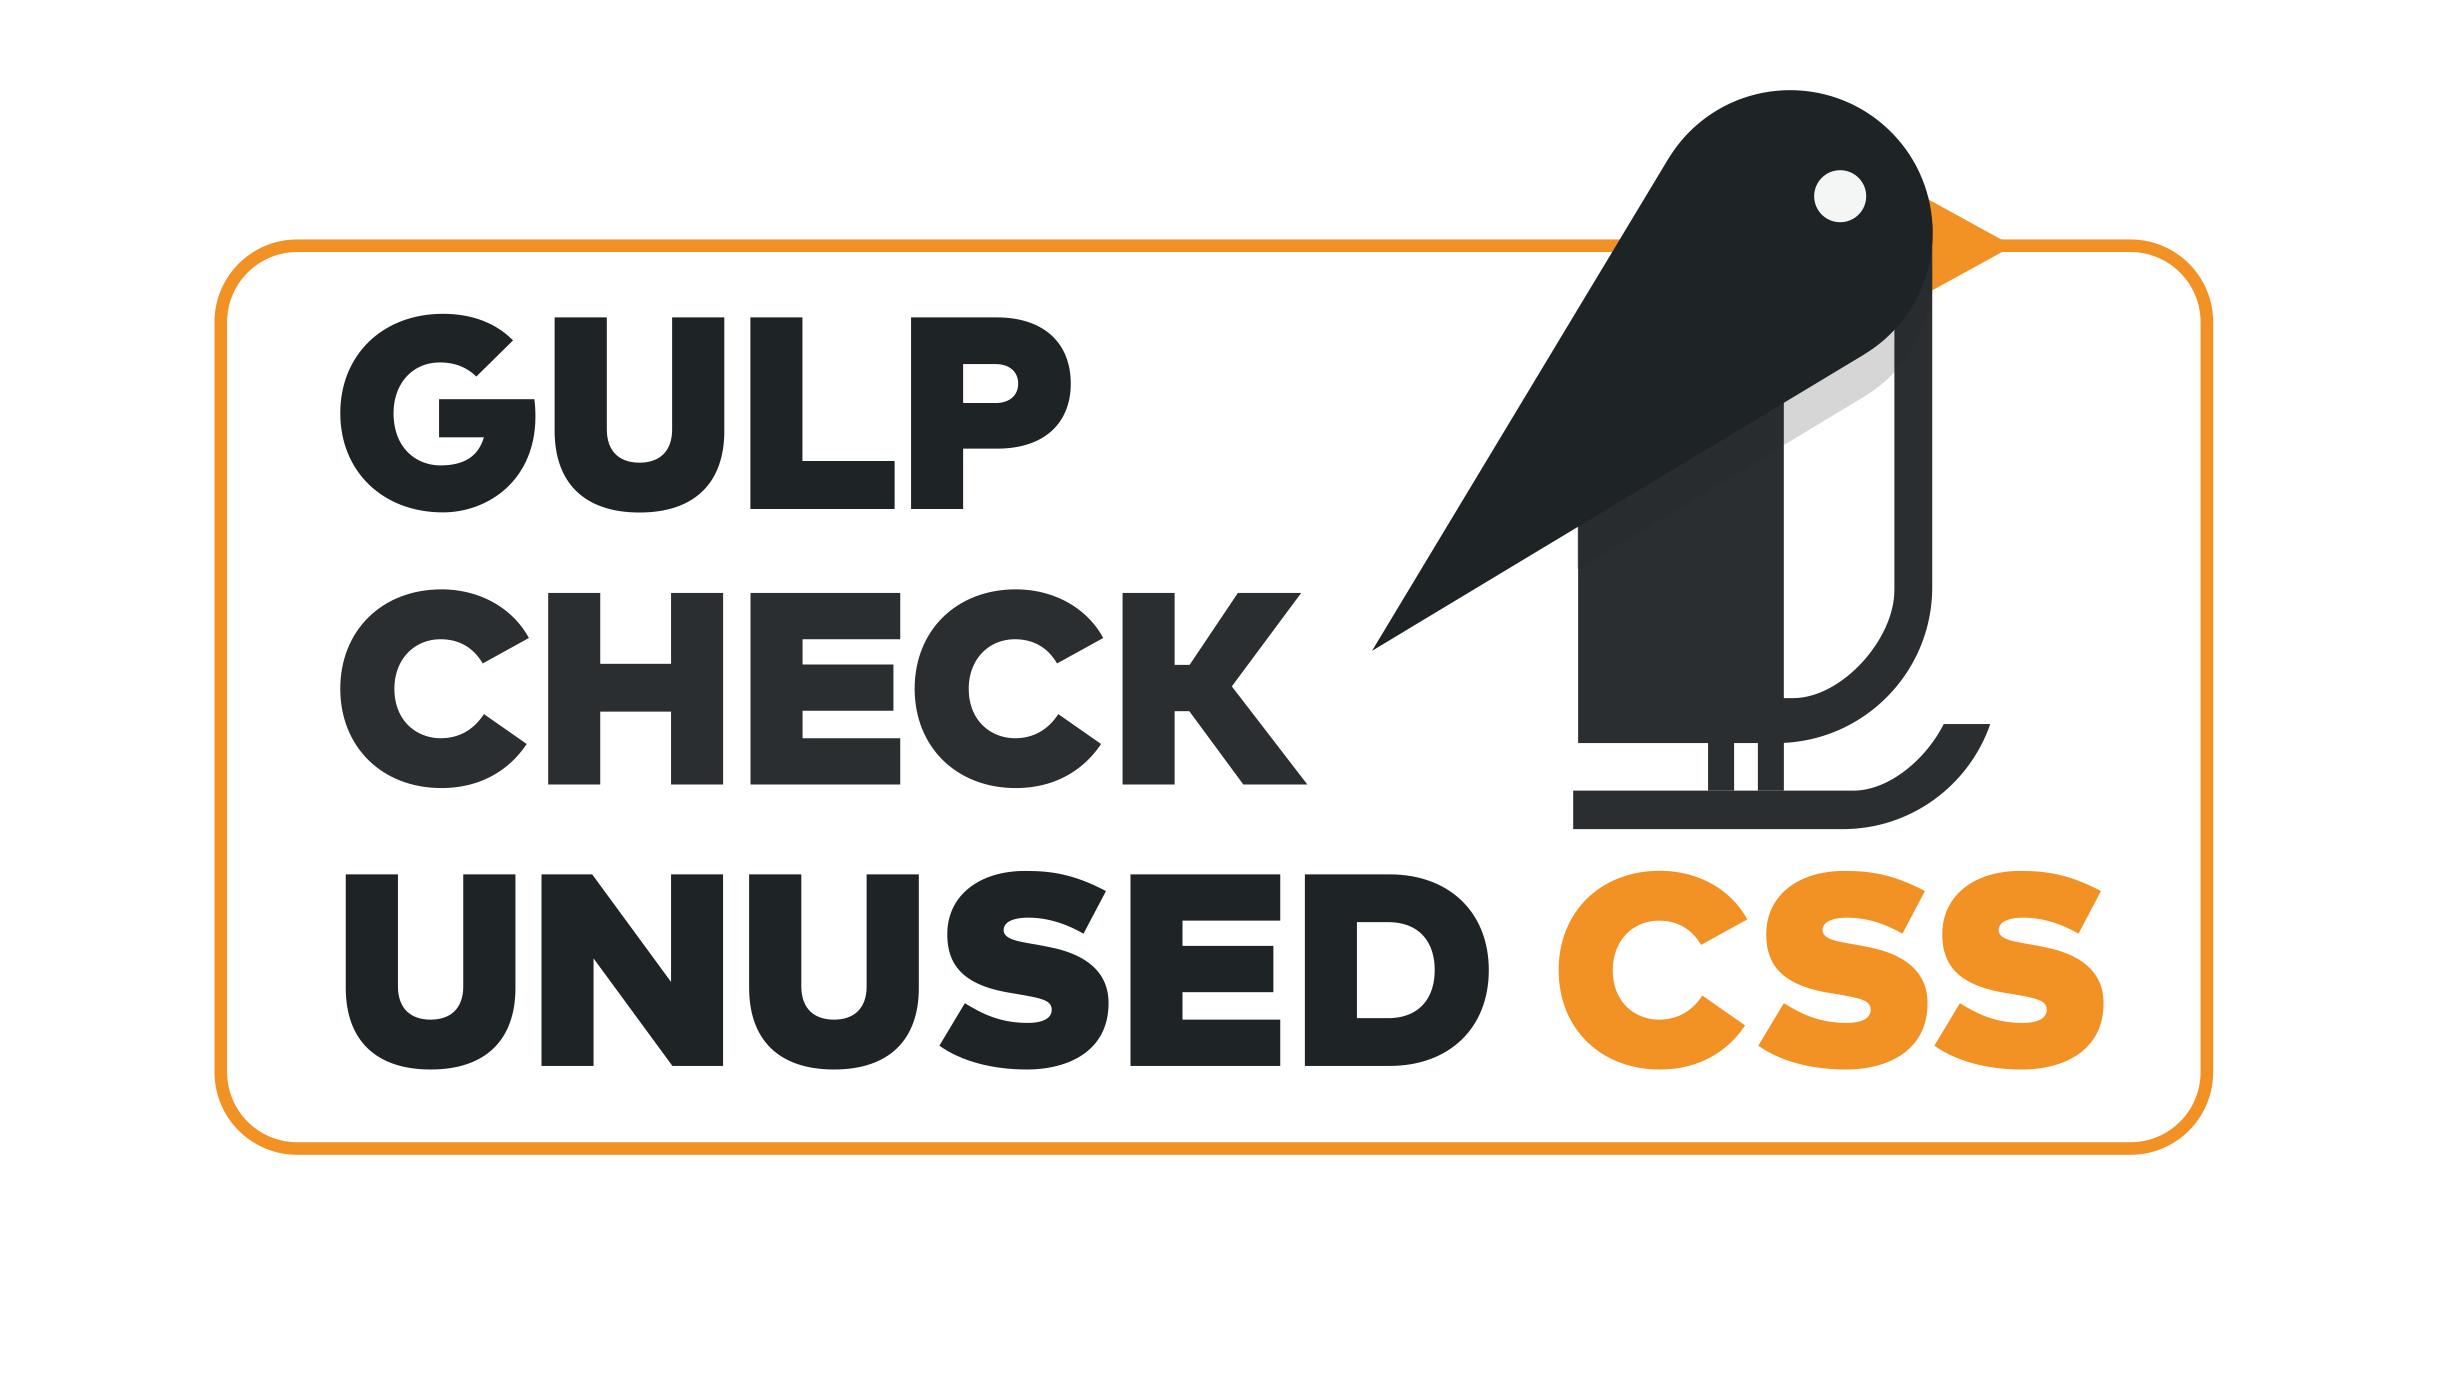 gulp-check-unused-css